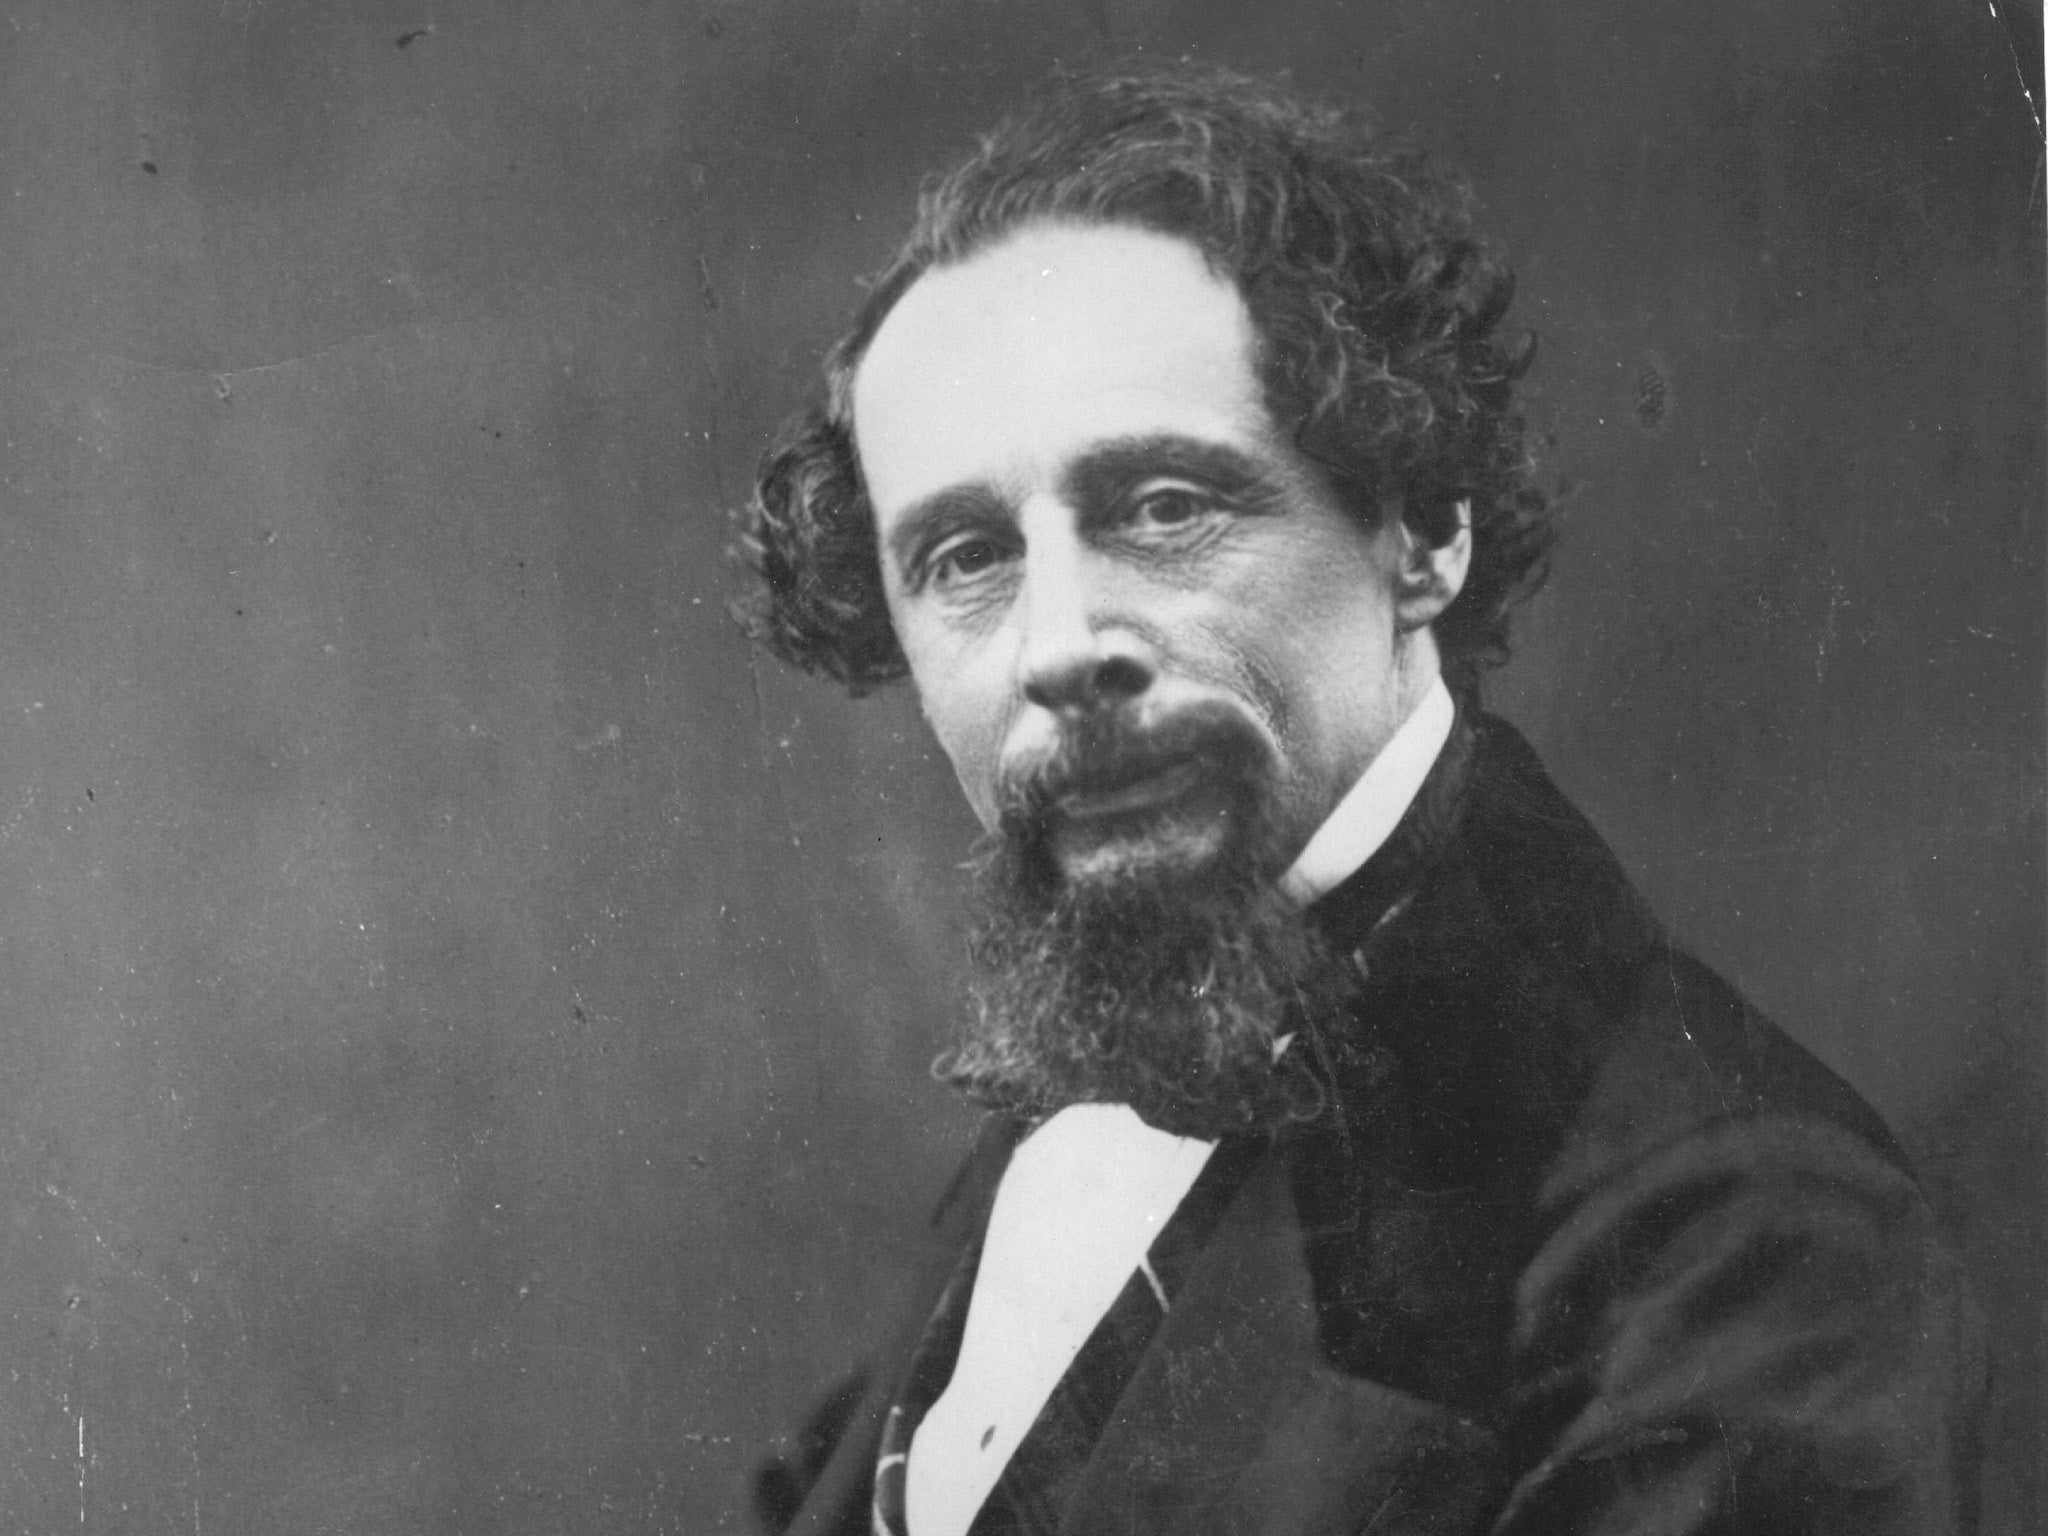 Charles Dickens' 10 best novels ranked: The Christmas Carol